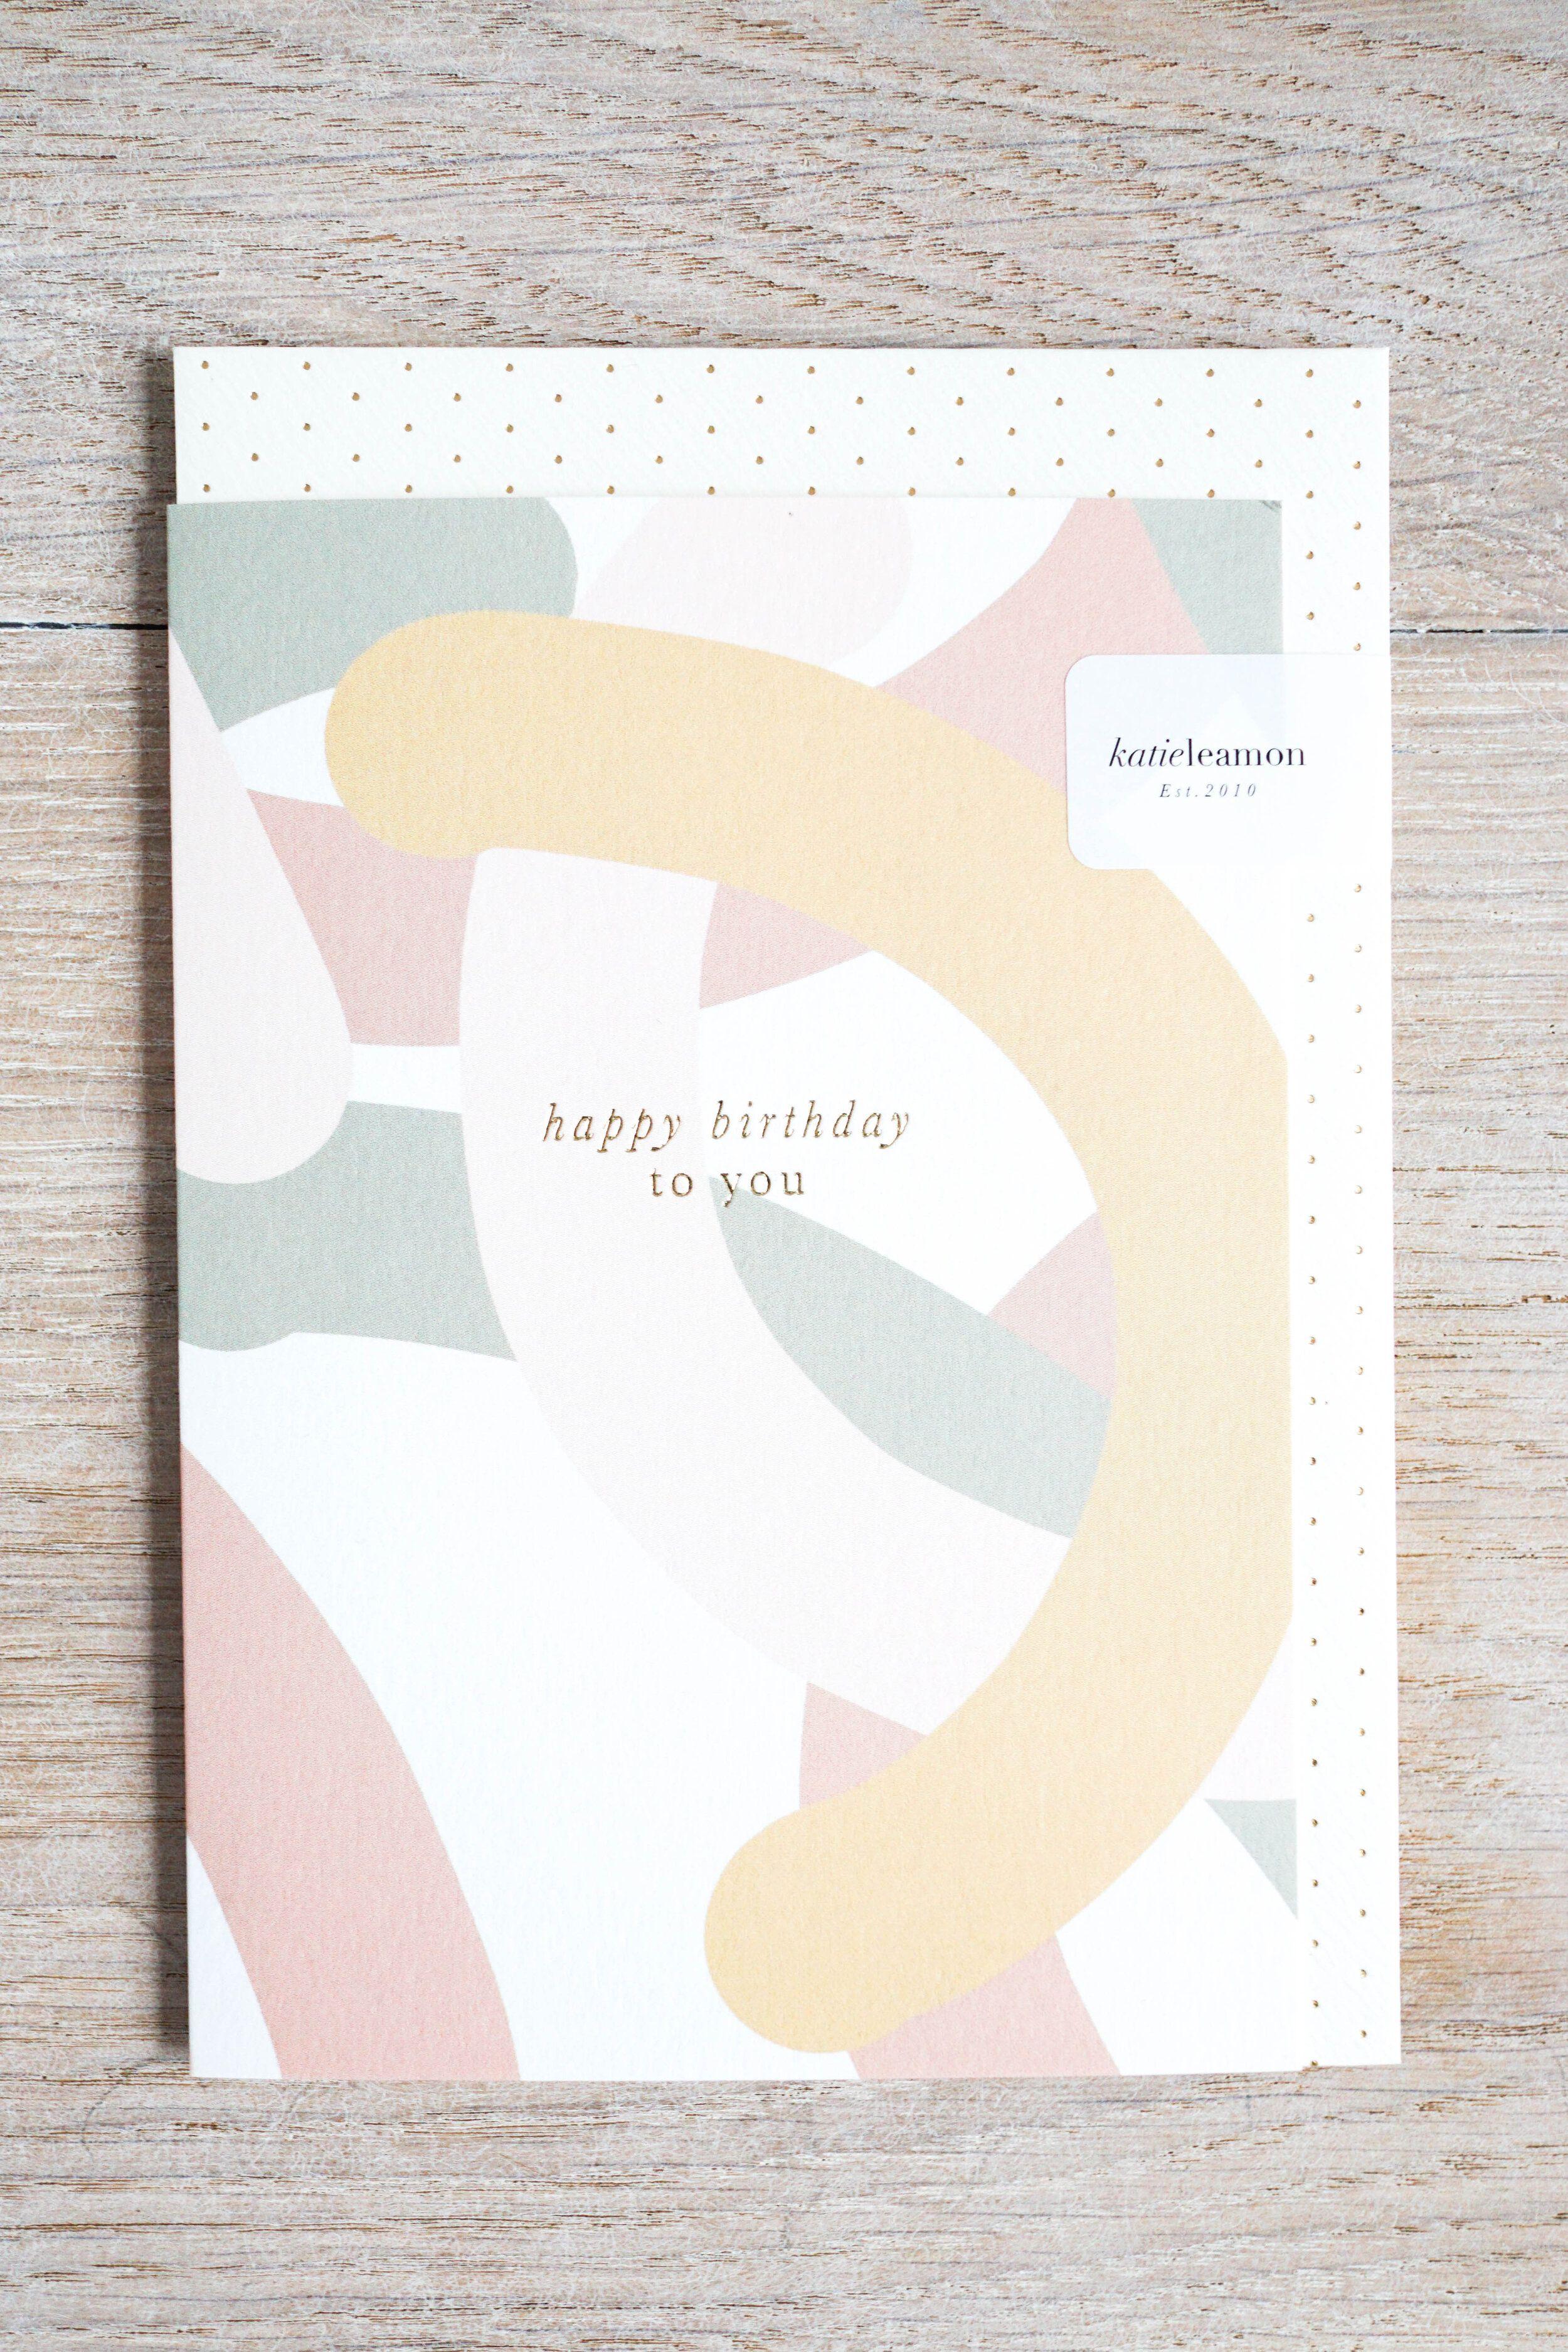 Mallow Birthday Card Aume Homeware Glasgow Luxury Birthday Cards Birthday Cards Luxury Birthday